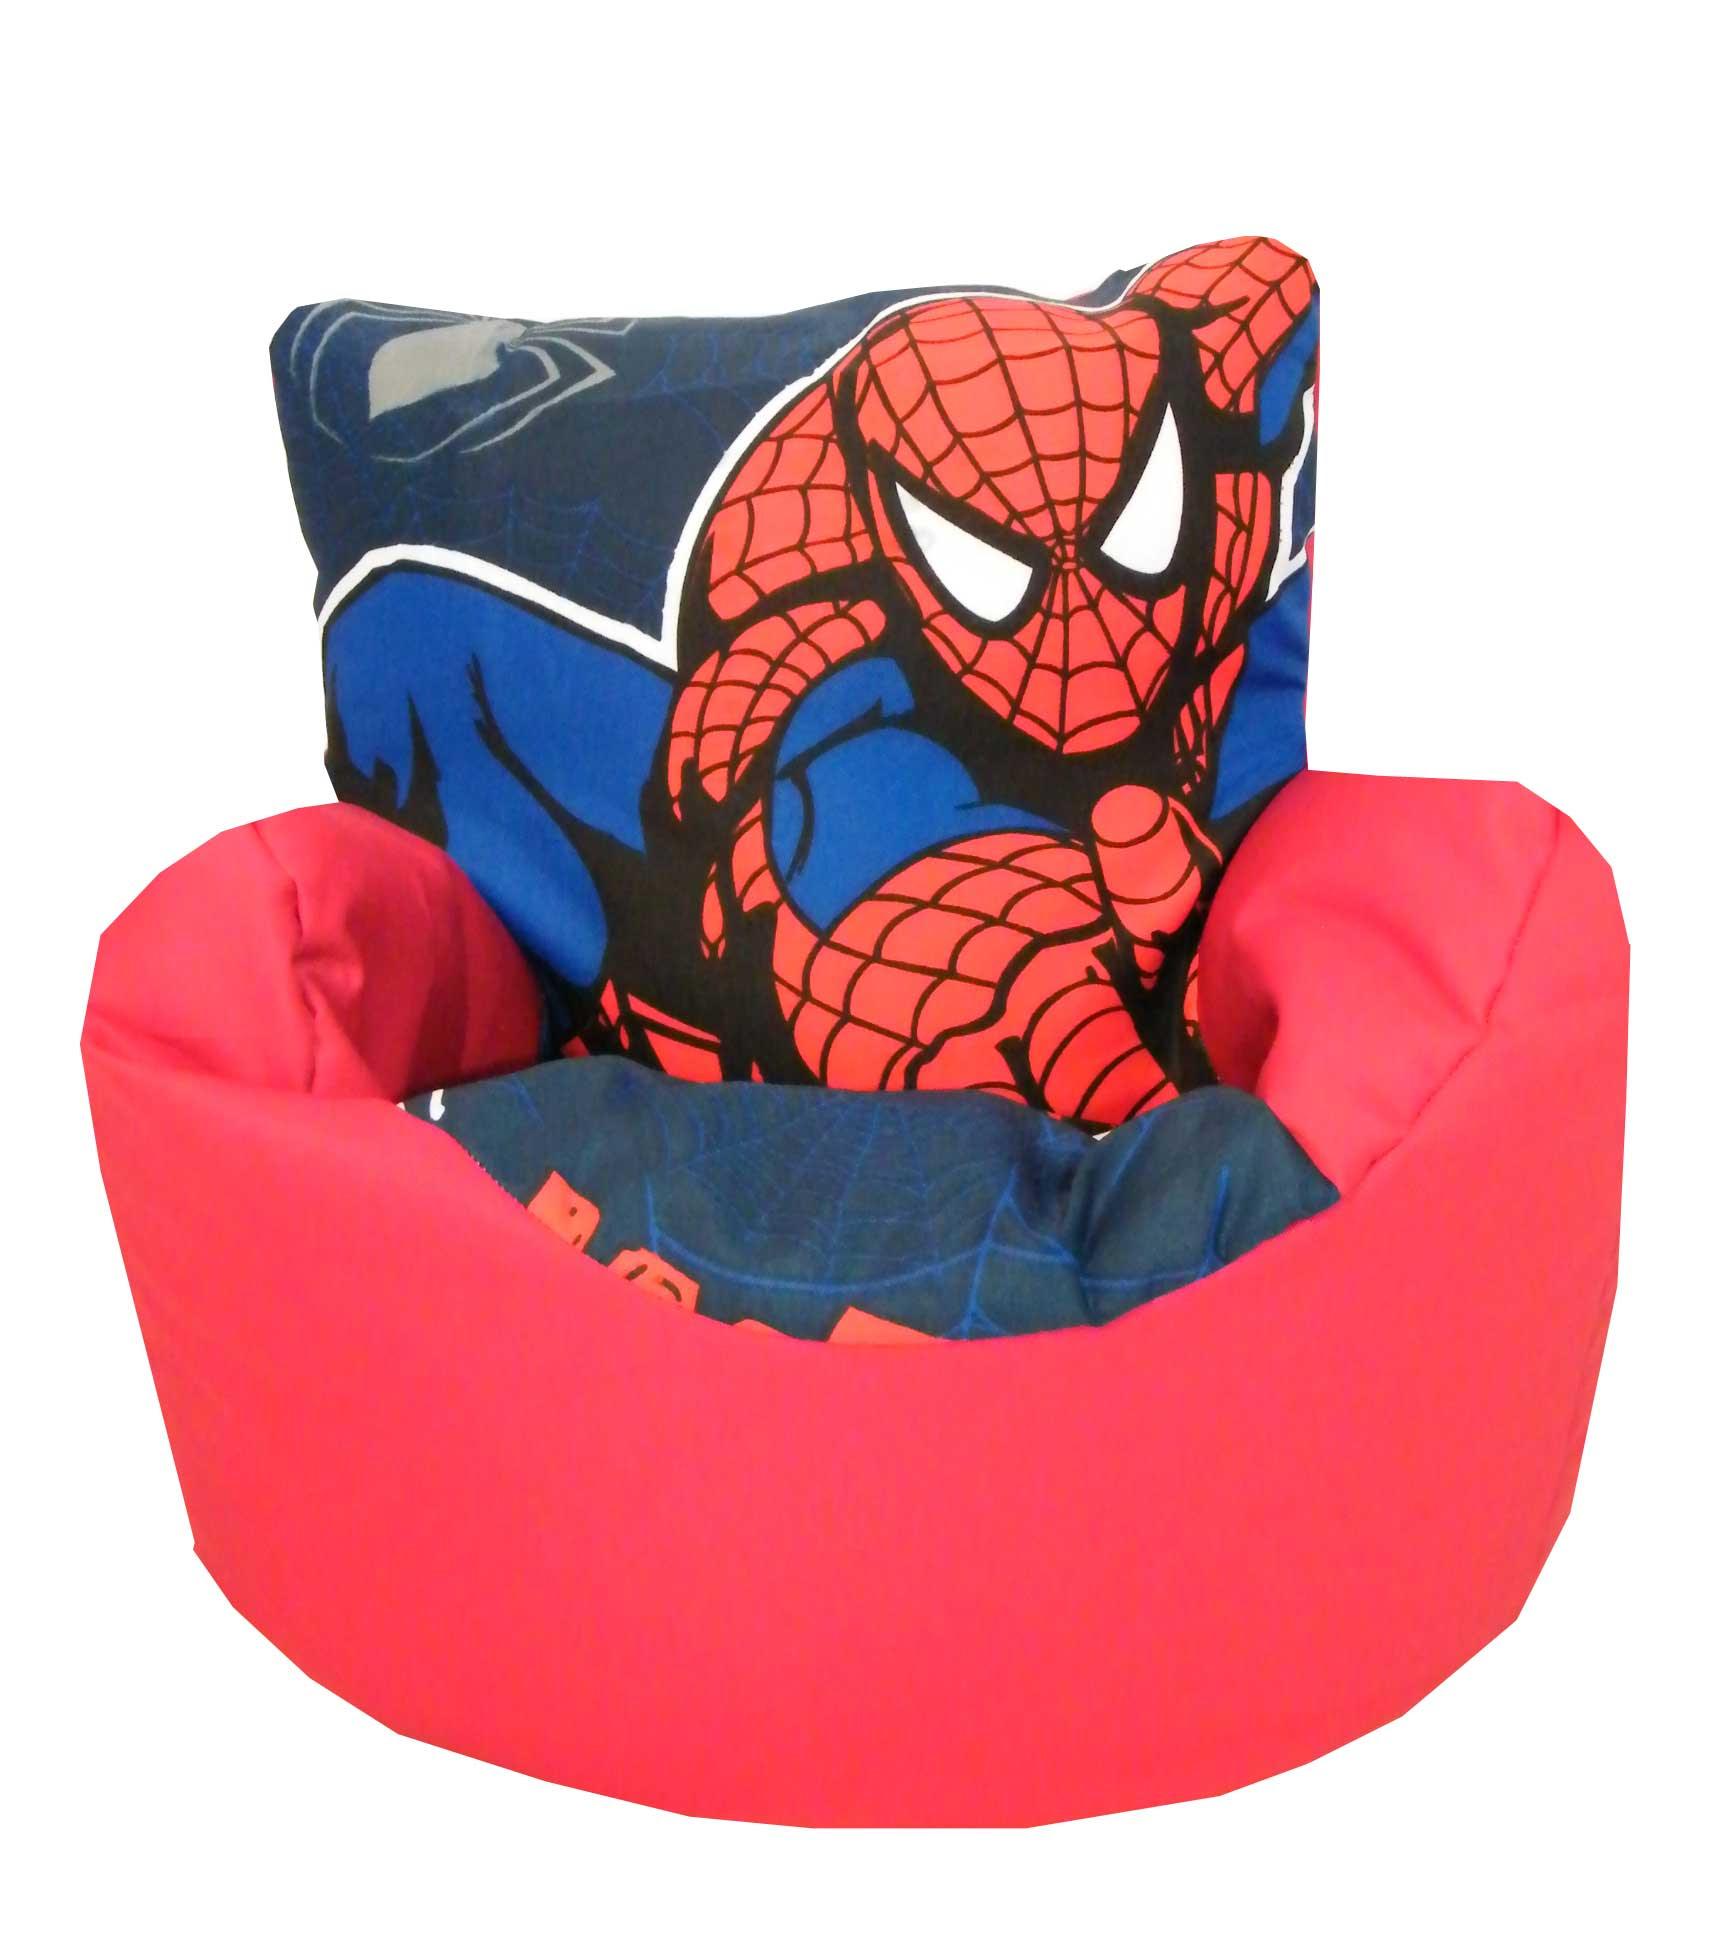 Kids Children's TV Disney Character Design Bean Bag Chair ...